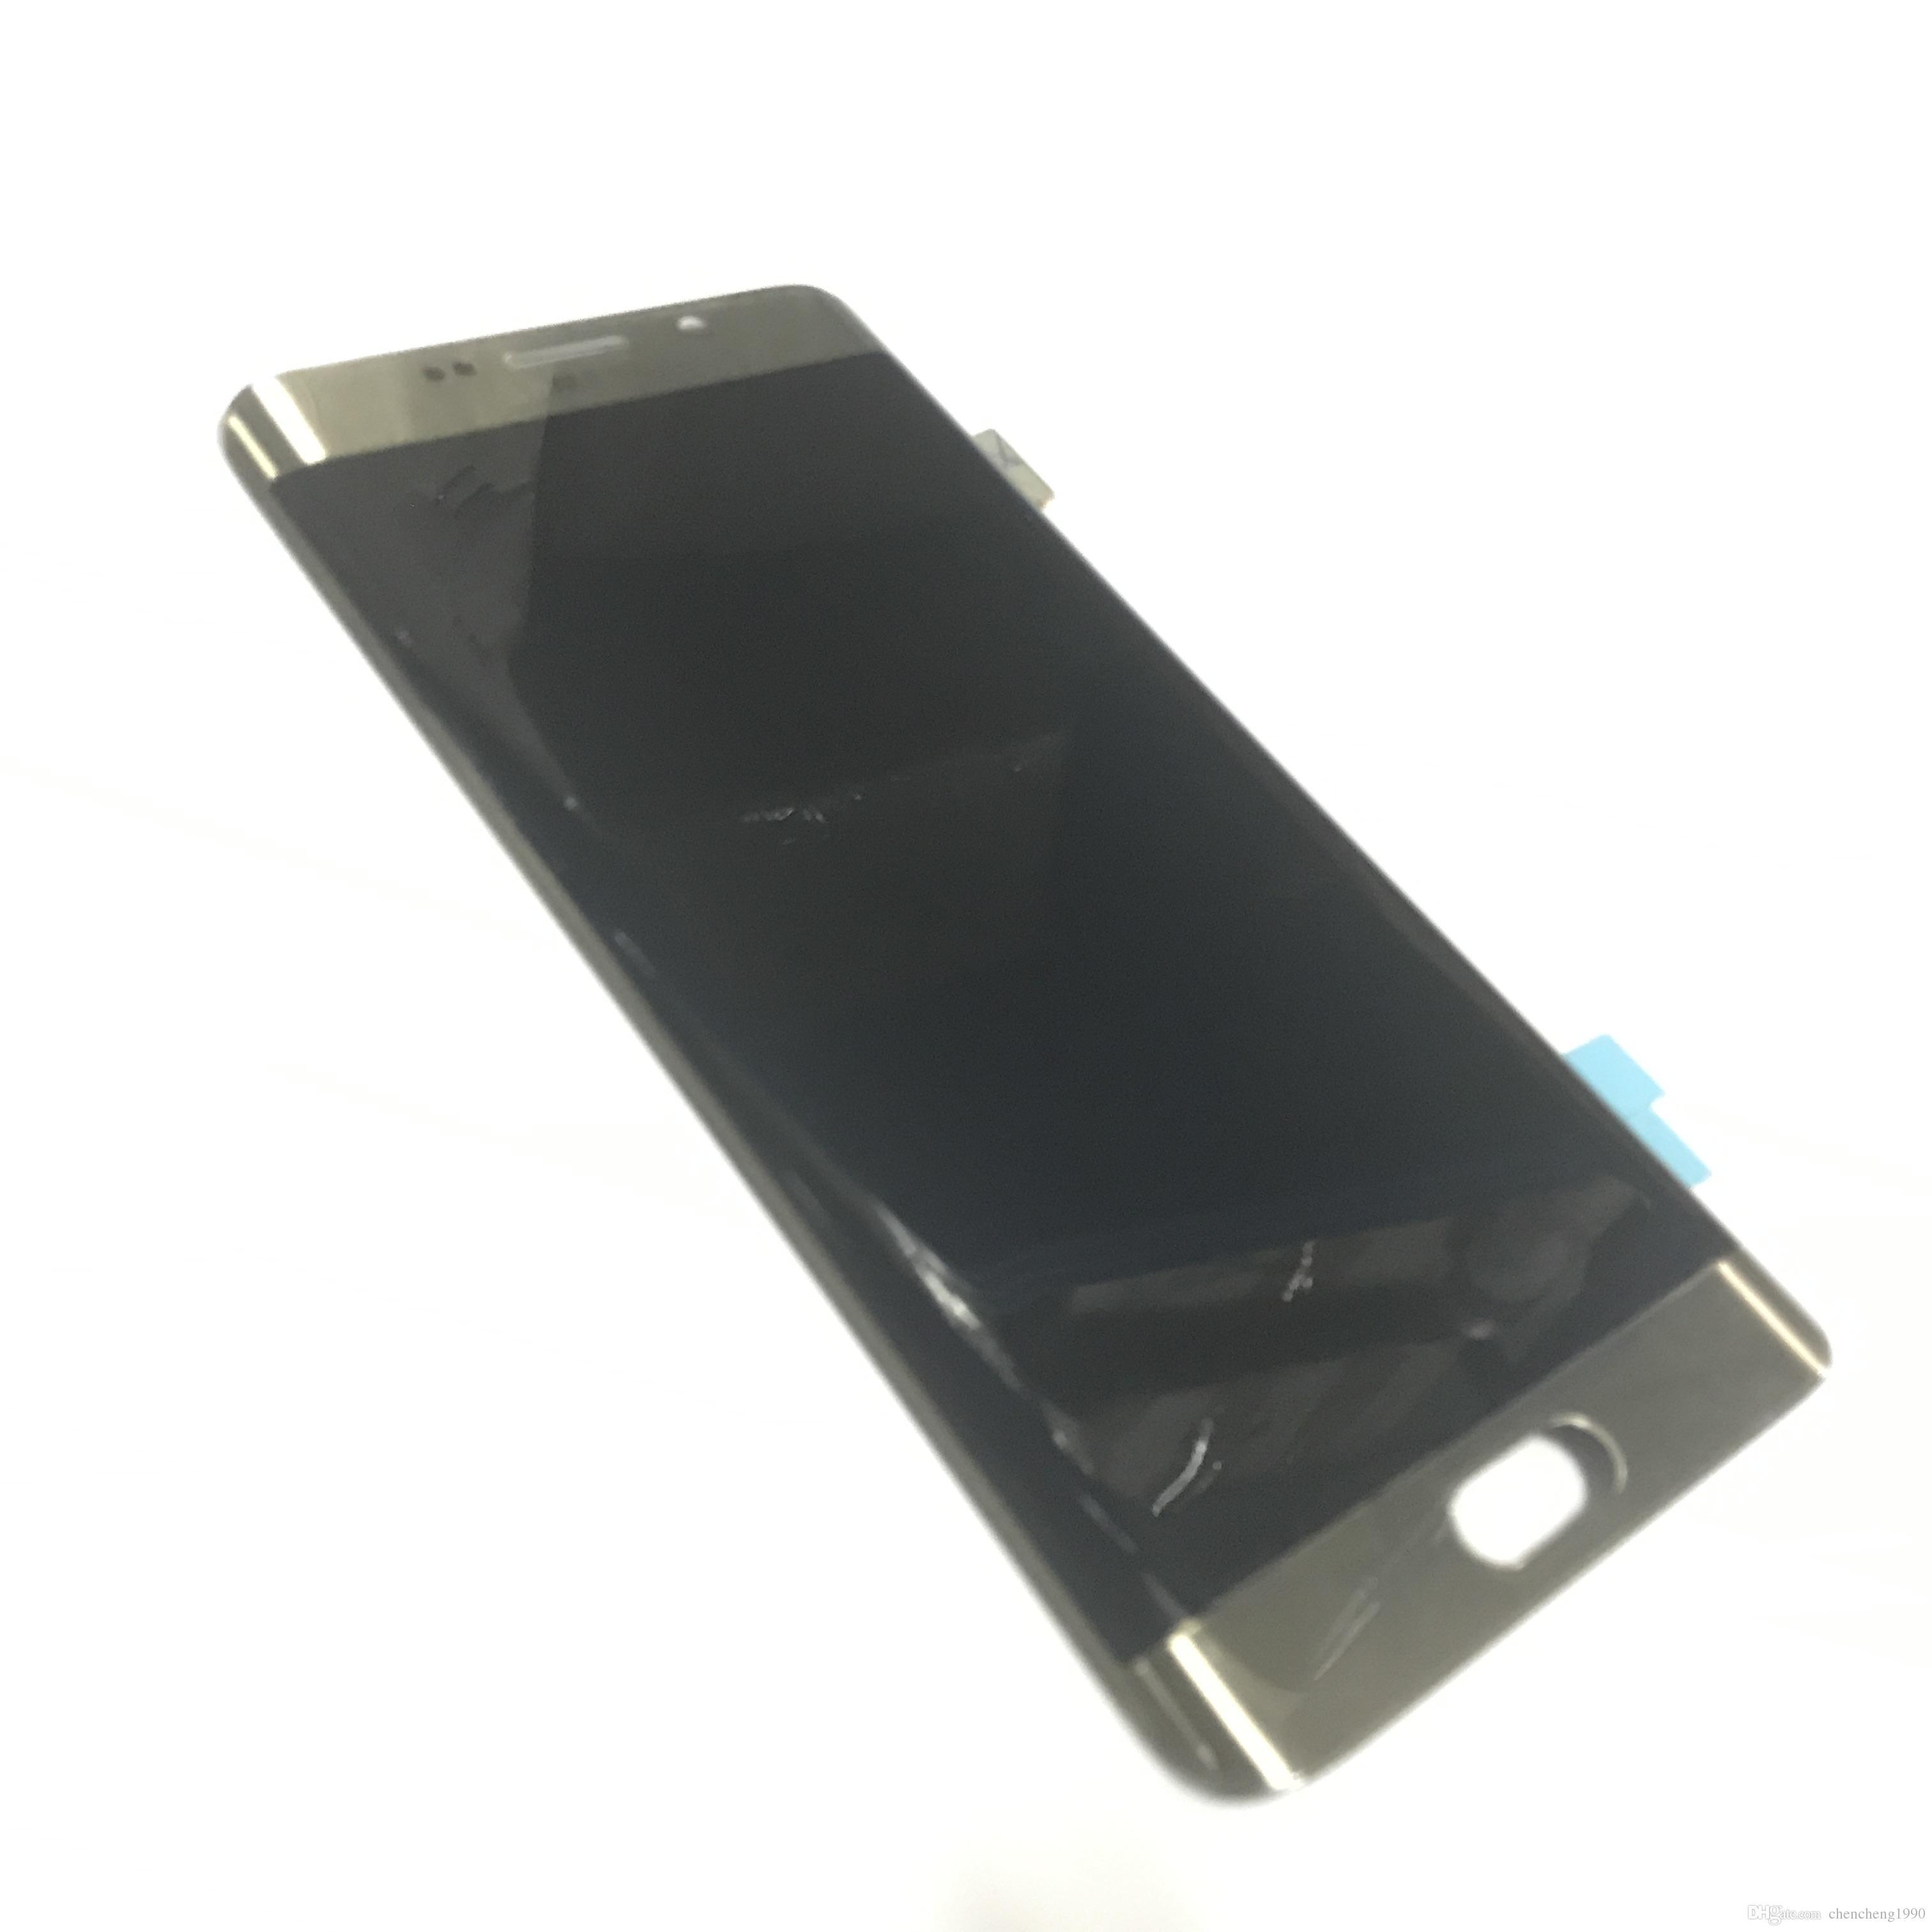 YENI Samsung Galaxy S6 Kenar Artı G928F G928A G928V G928T G928P LCD Digitizer Meclisi Orijinal LCD Ekran Dokunmatik Ekran PANELI